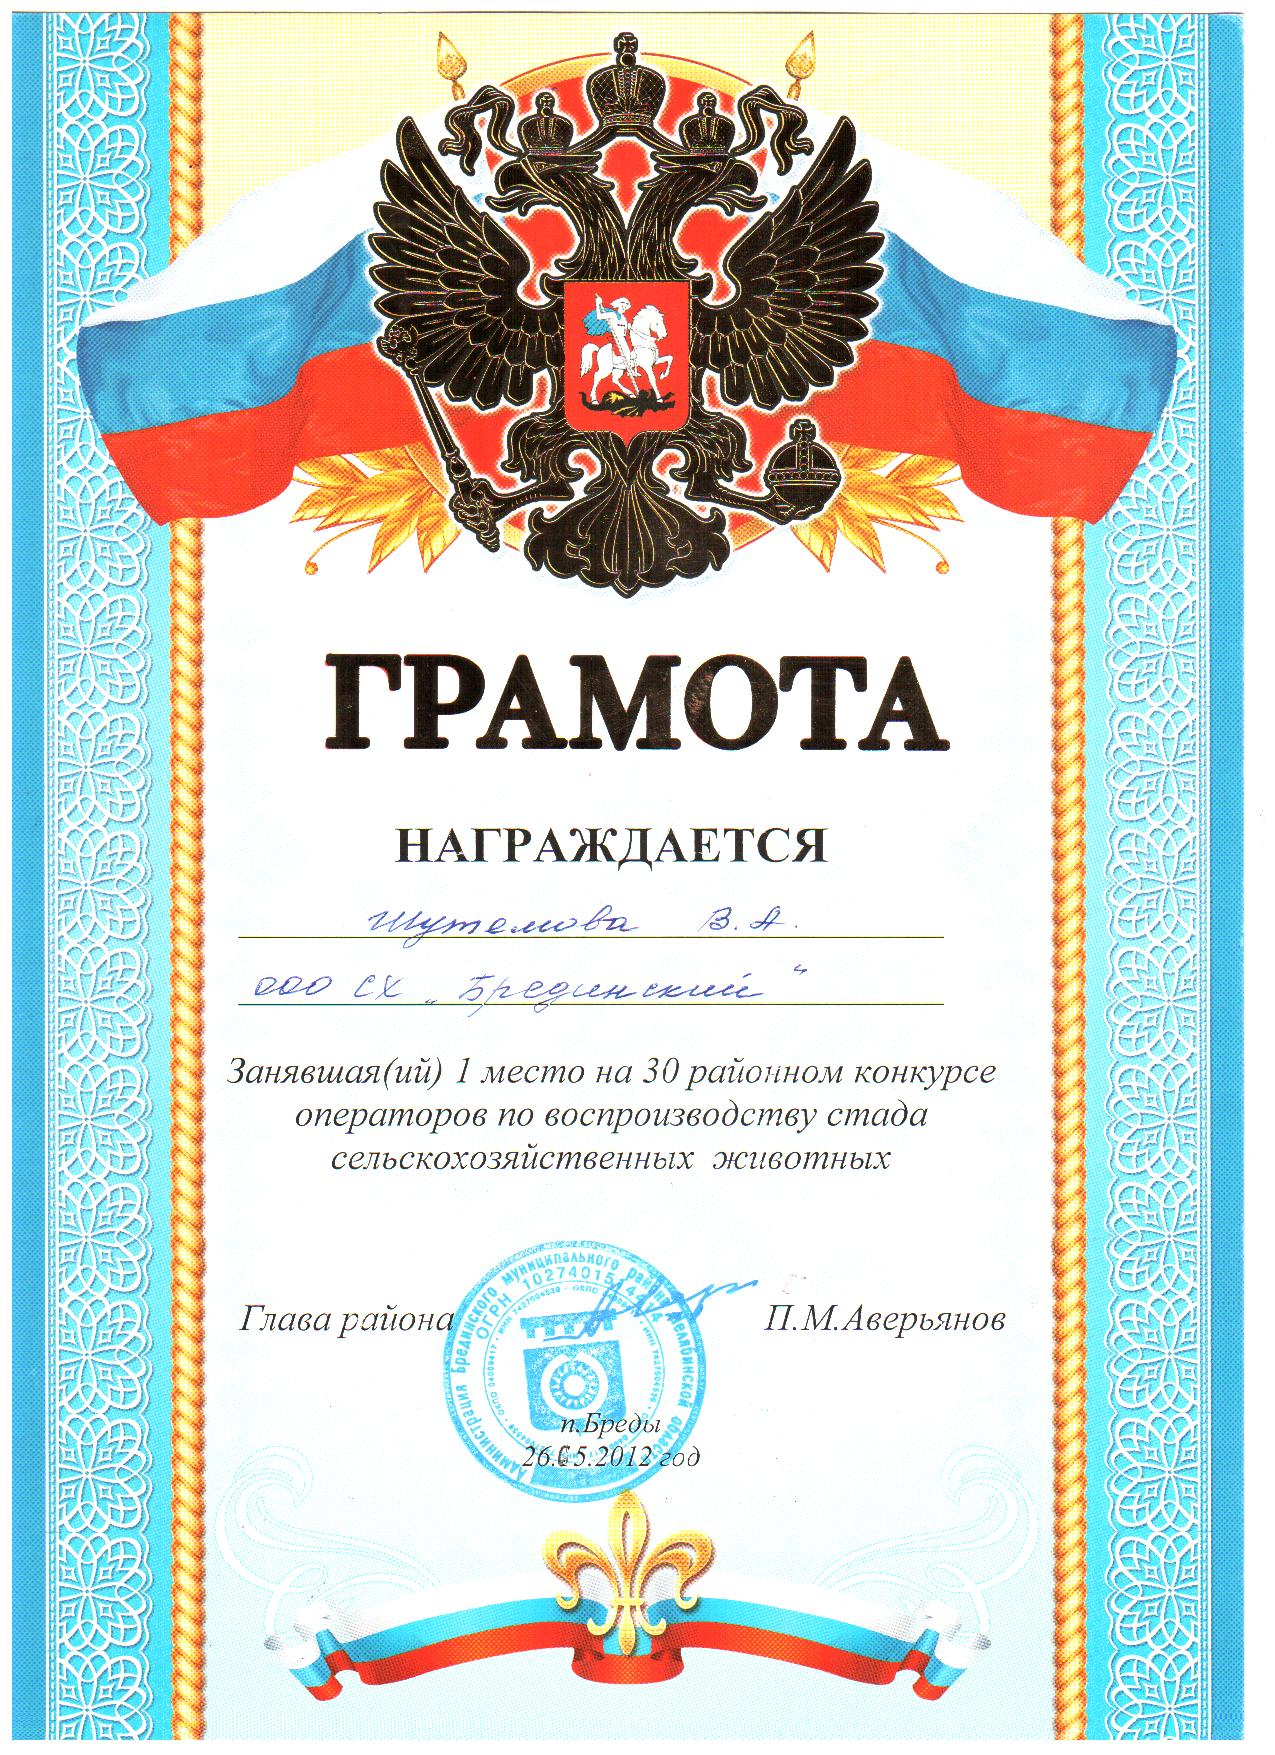 C:\Documents and Settings\Администратор\Рабочий стол\Шутёмова приложение\Изображение 007.jpg